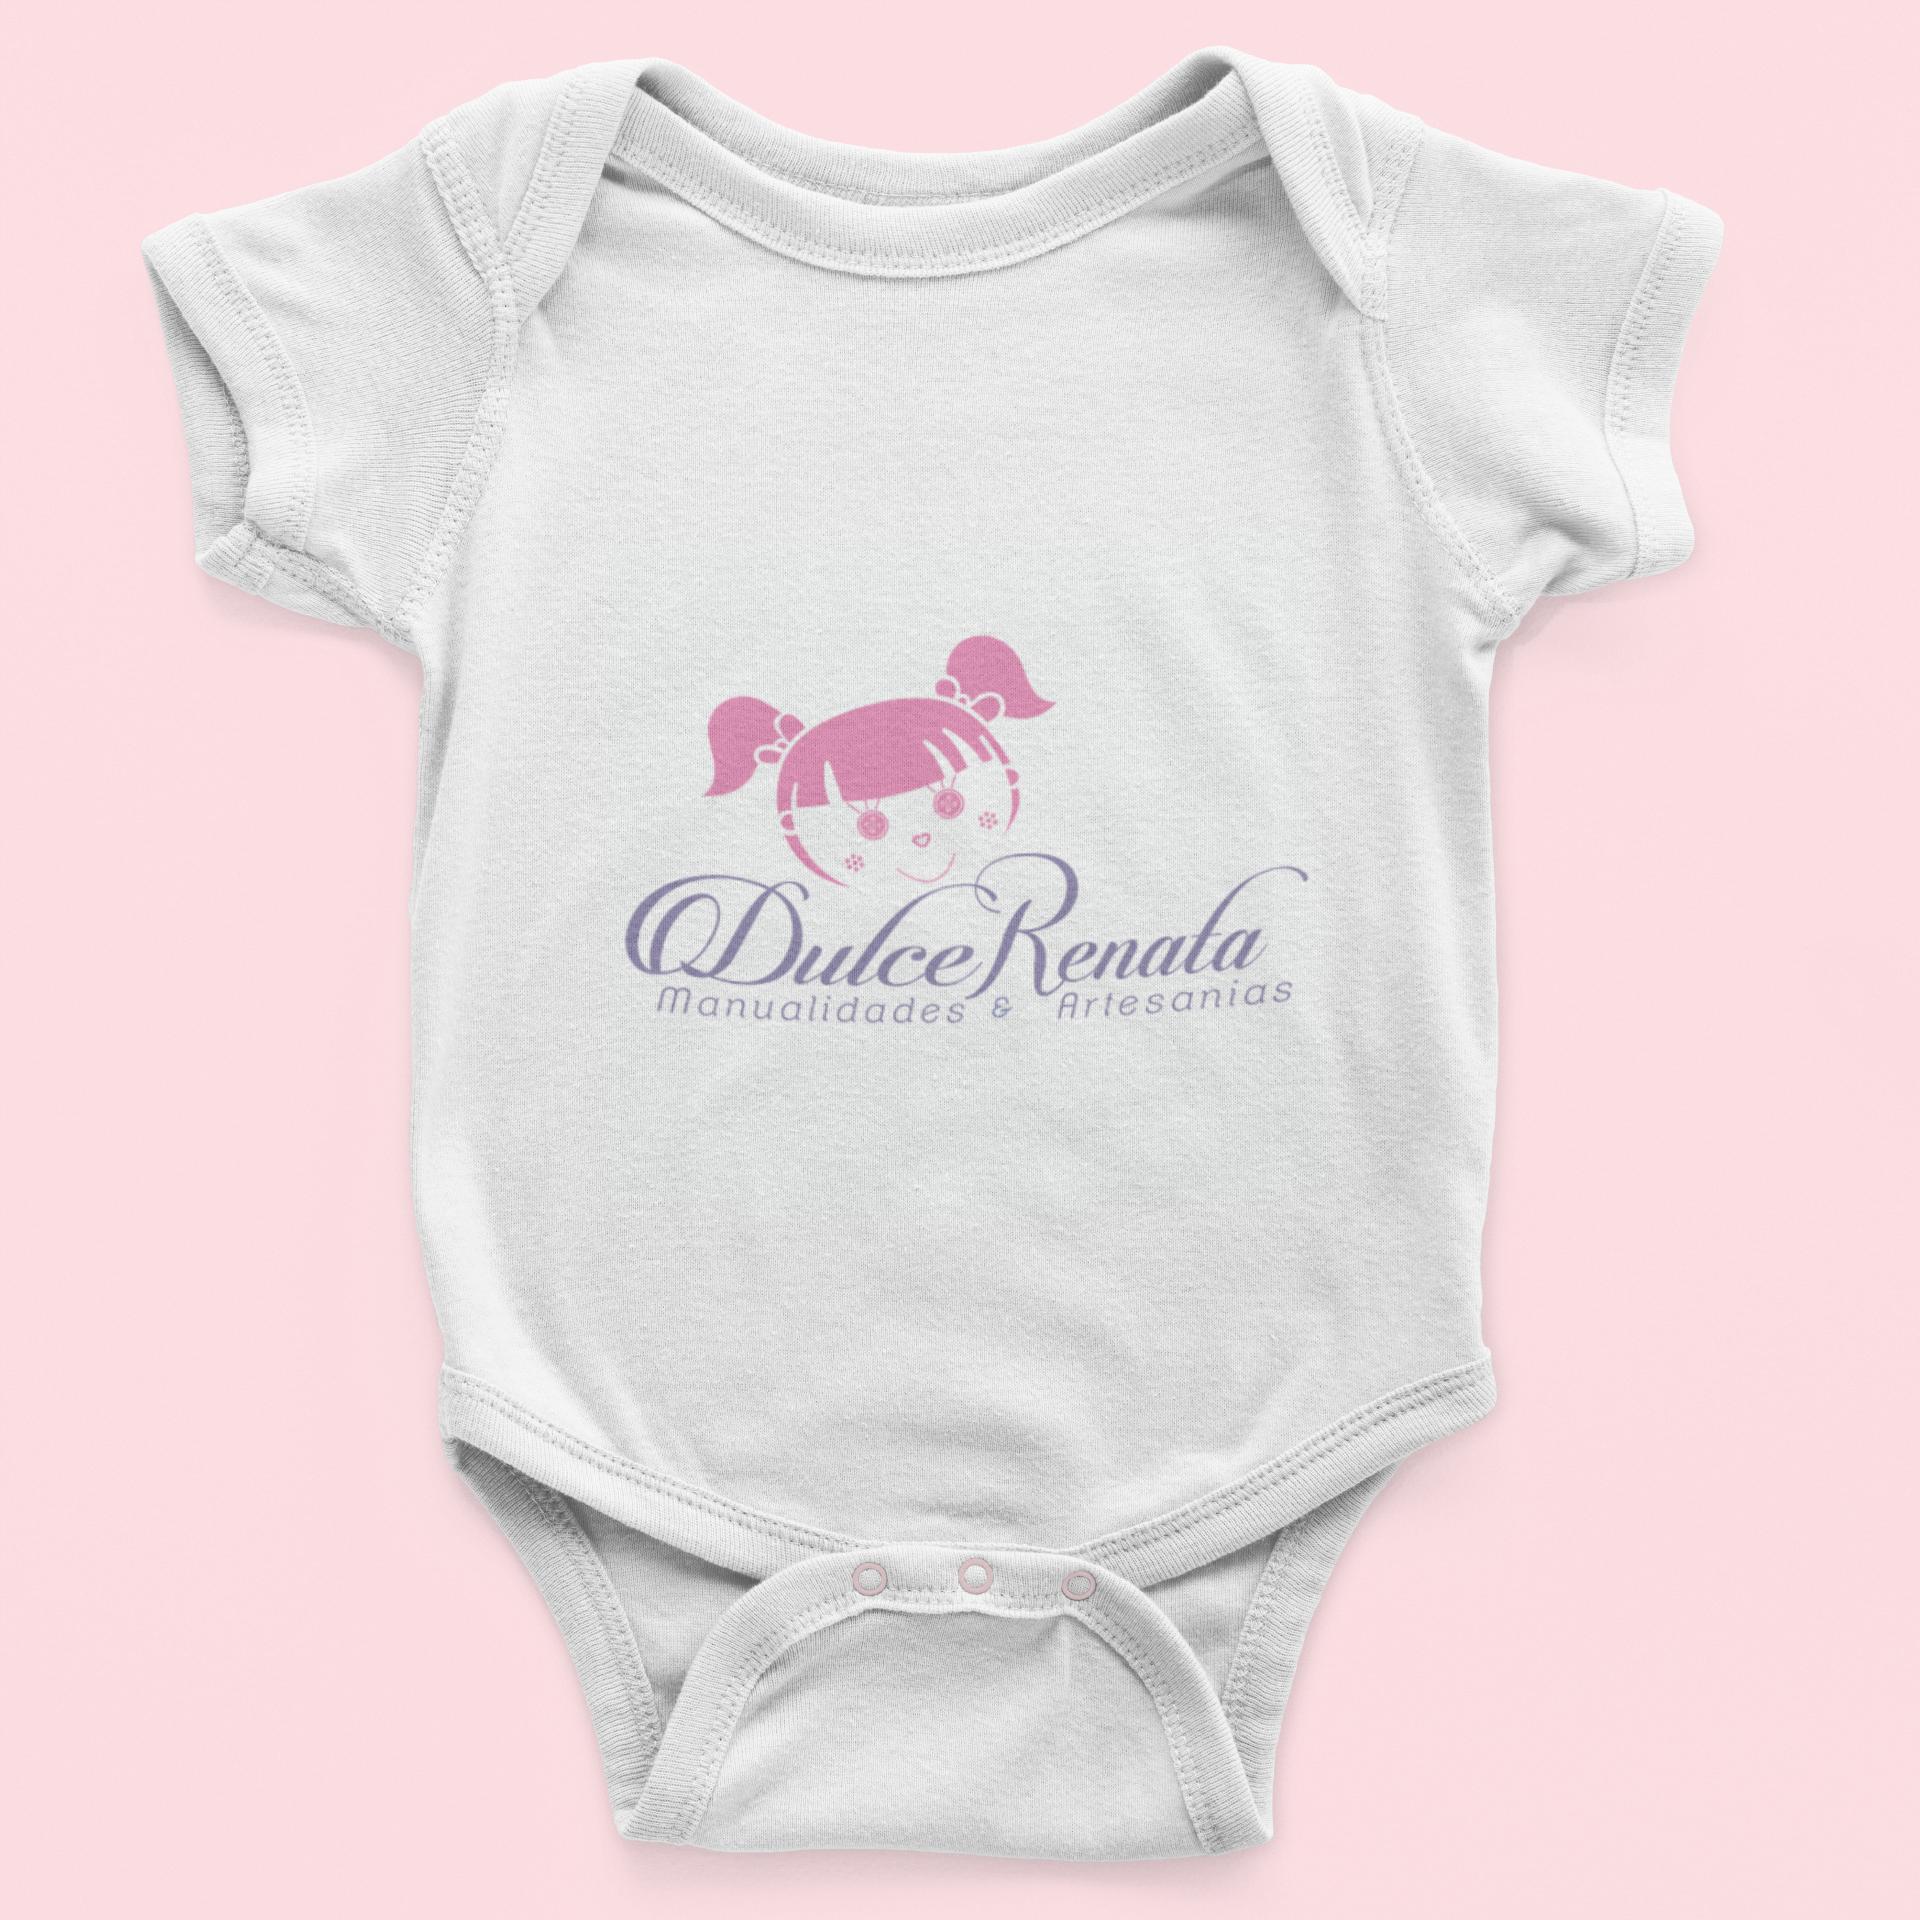 Branding - DulceRenata